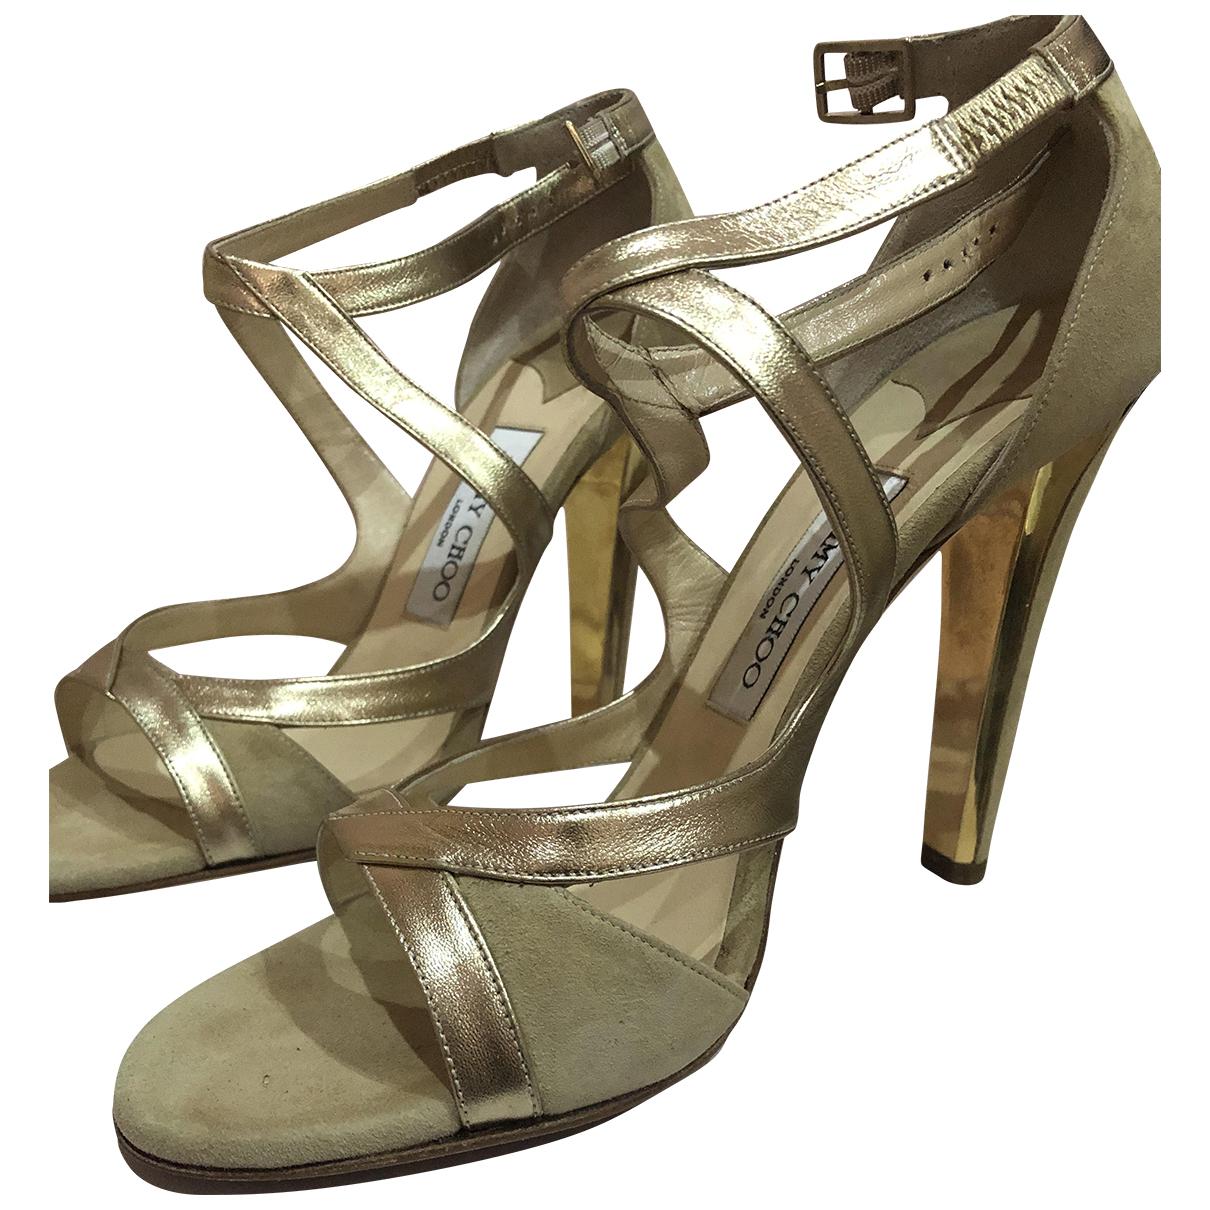 Jimmy Choo Lance Beige Leather Sandals for Women 39.5 EU